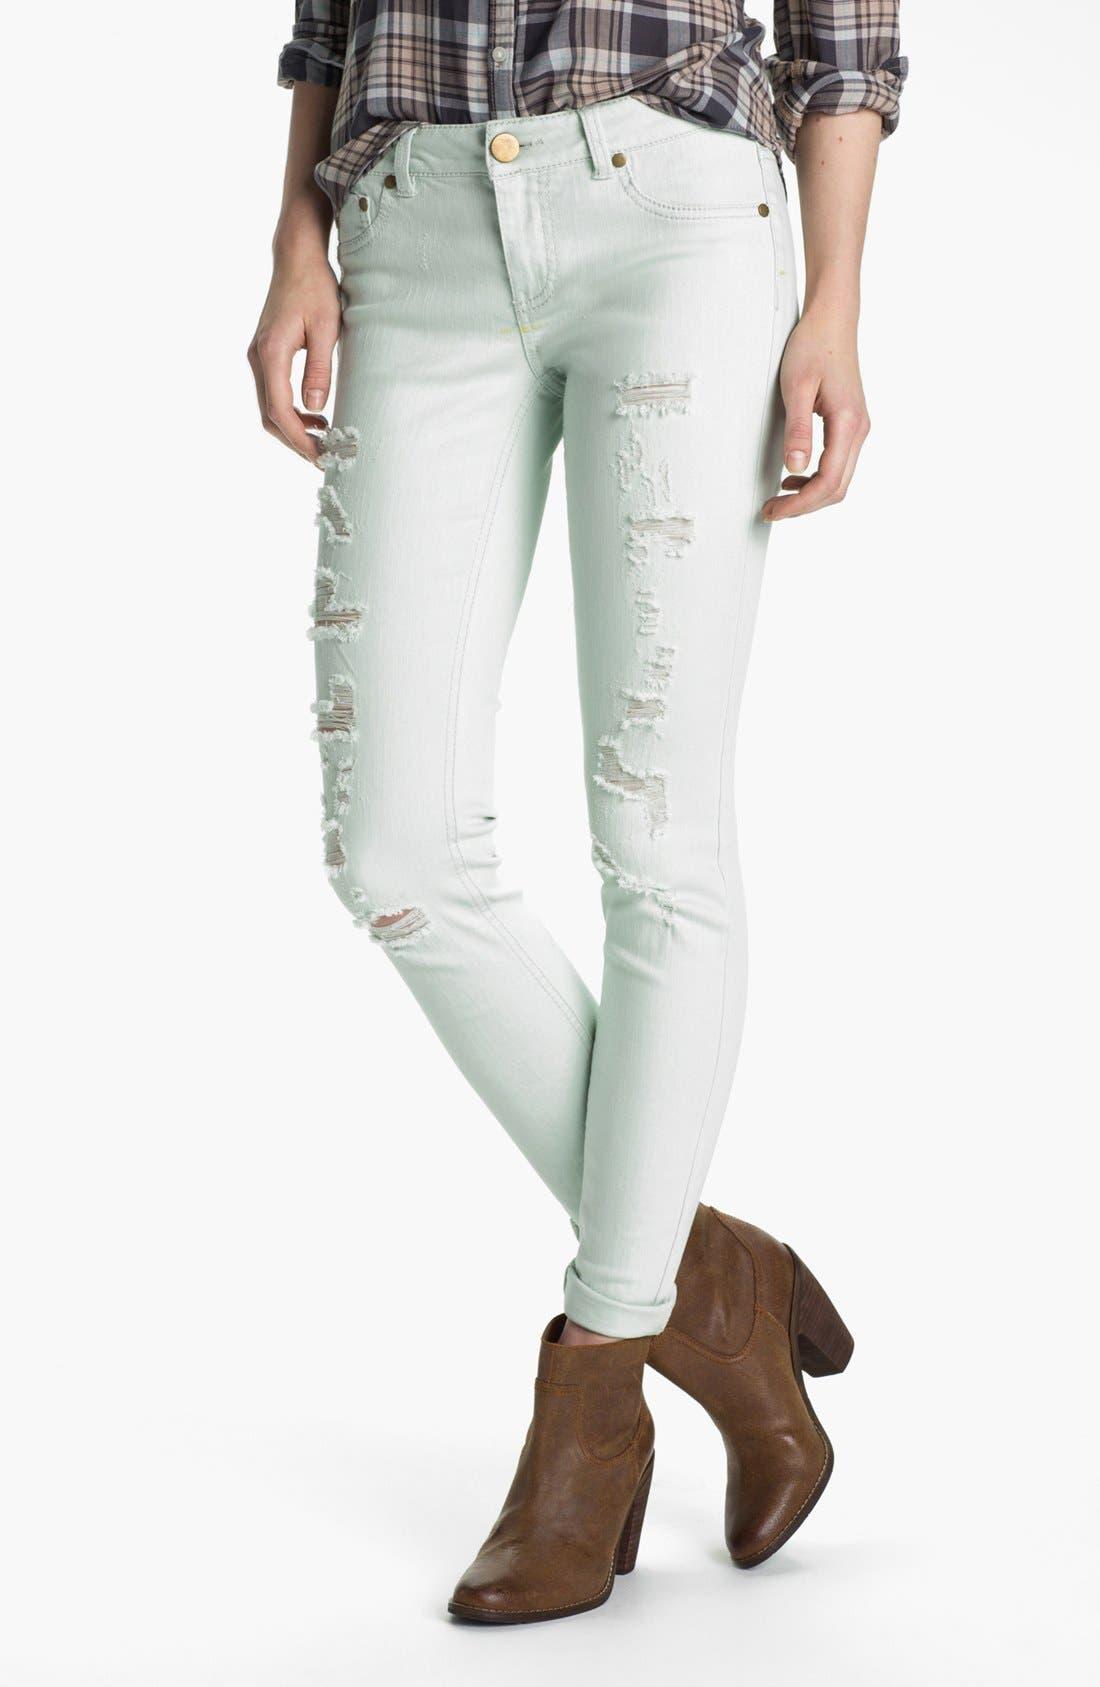 LOVE, FIRE Fire Destroyed Pastel Denim Skinny Jeans, Main, color, 440